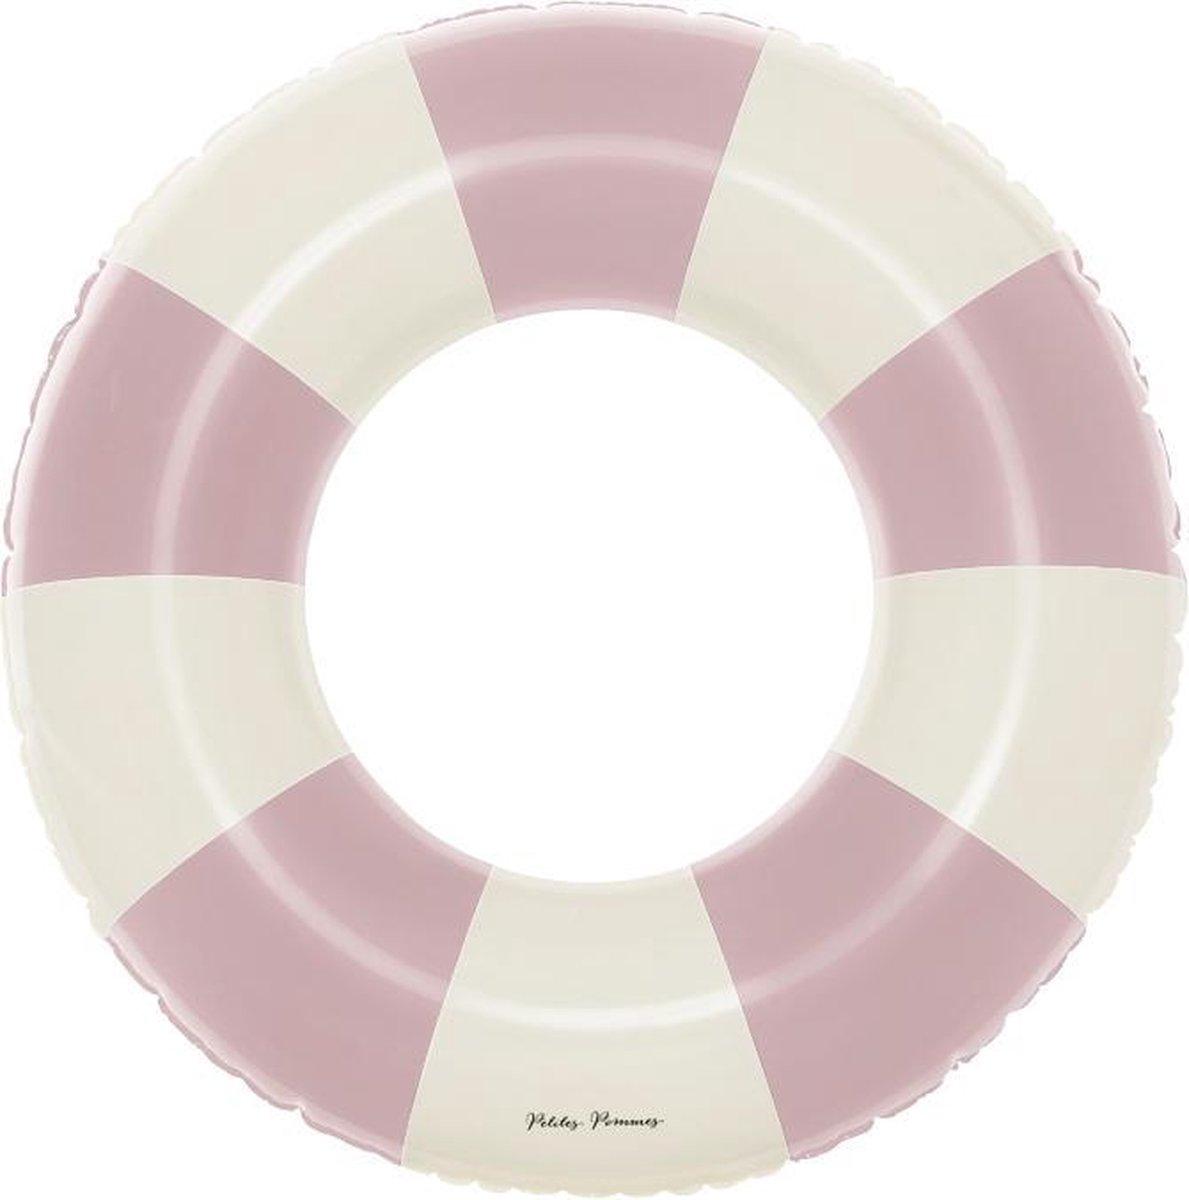 Petites Pommes Zwemring Anna French Rose - Zwemband - ø 60 cm - 3+ jaar